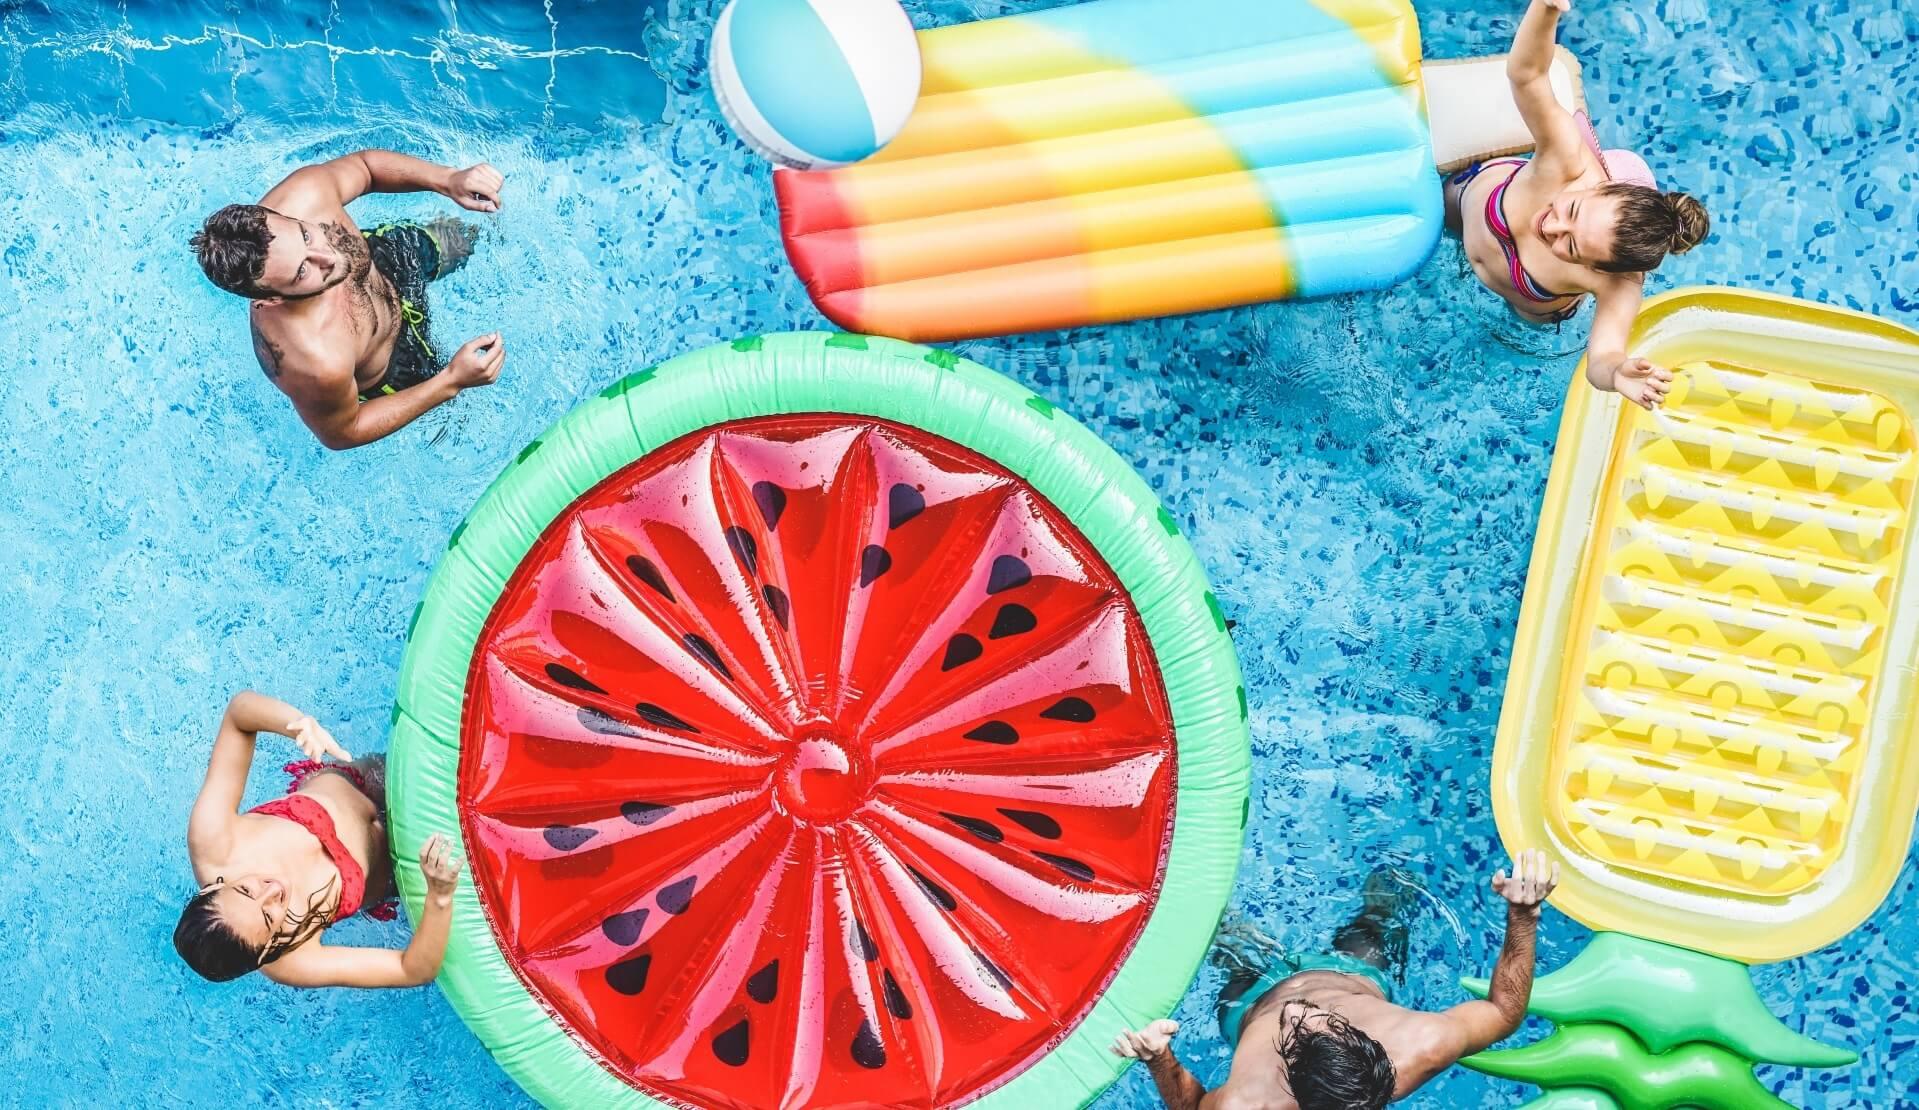 Poolparty Ibiza